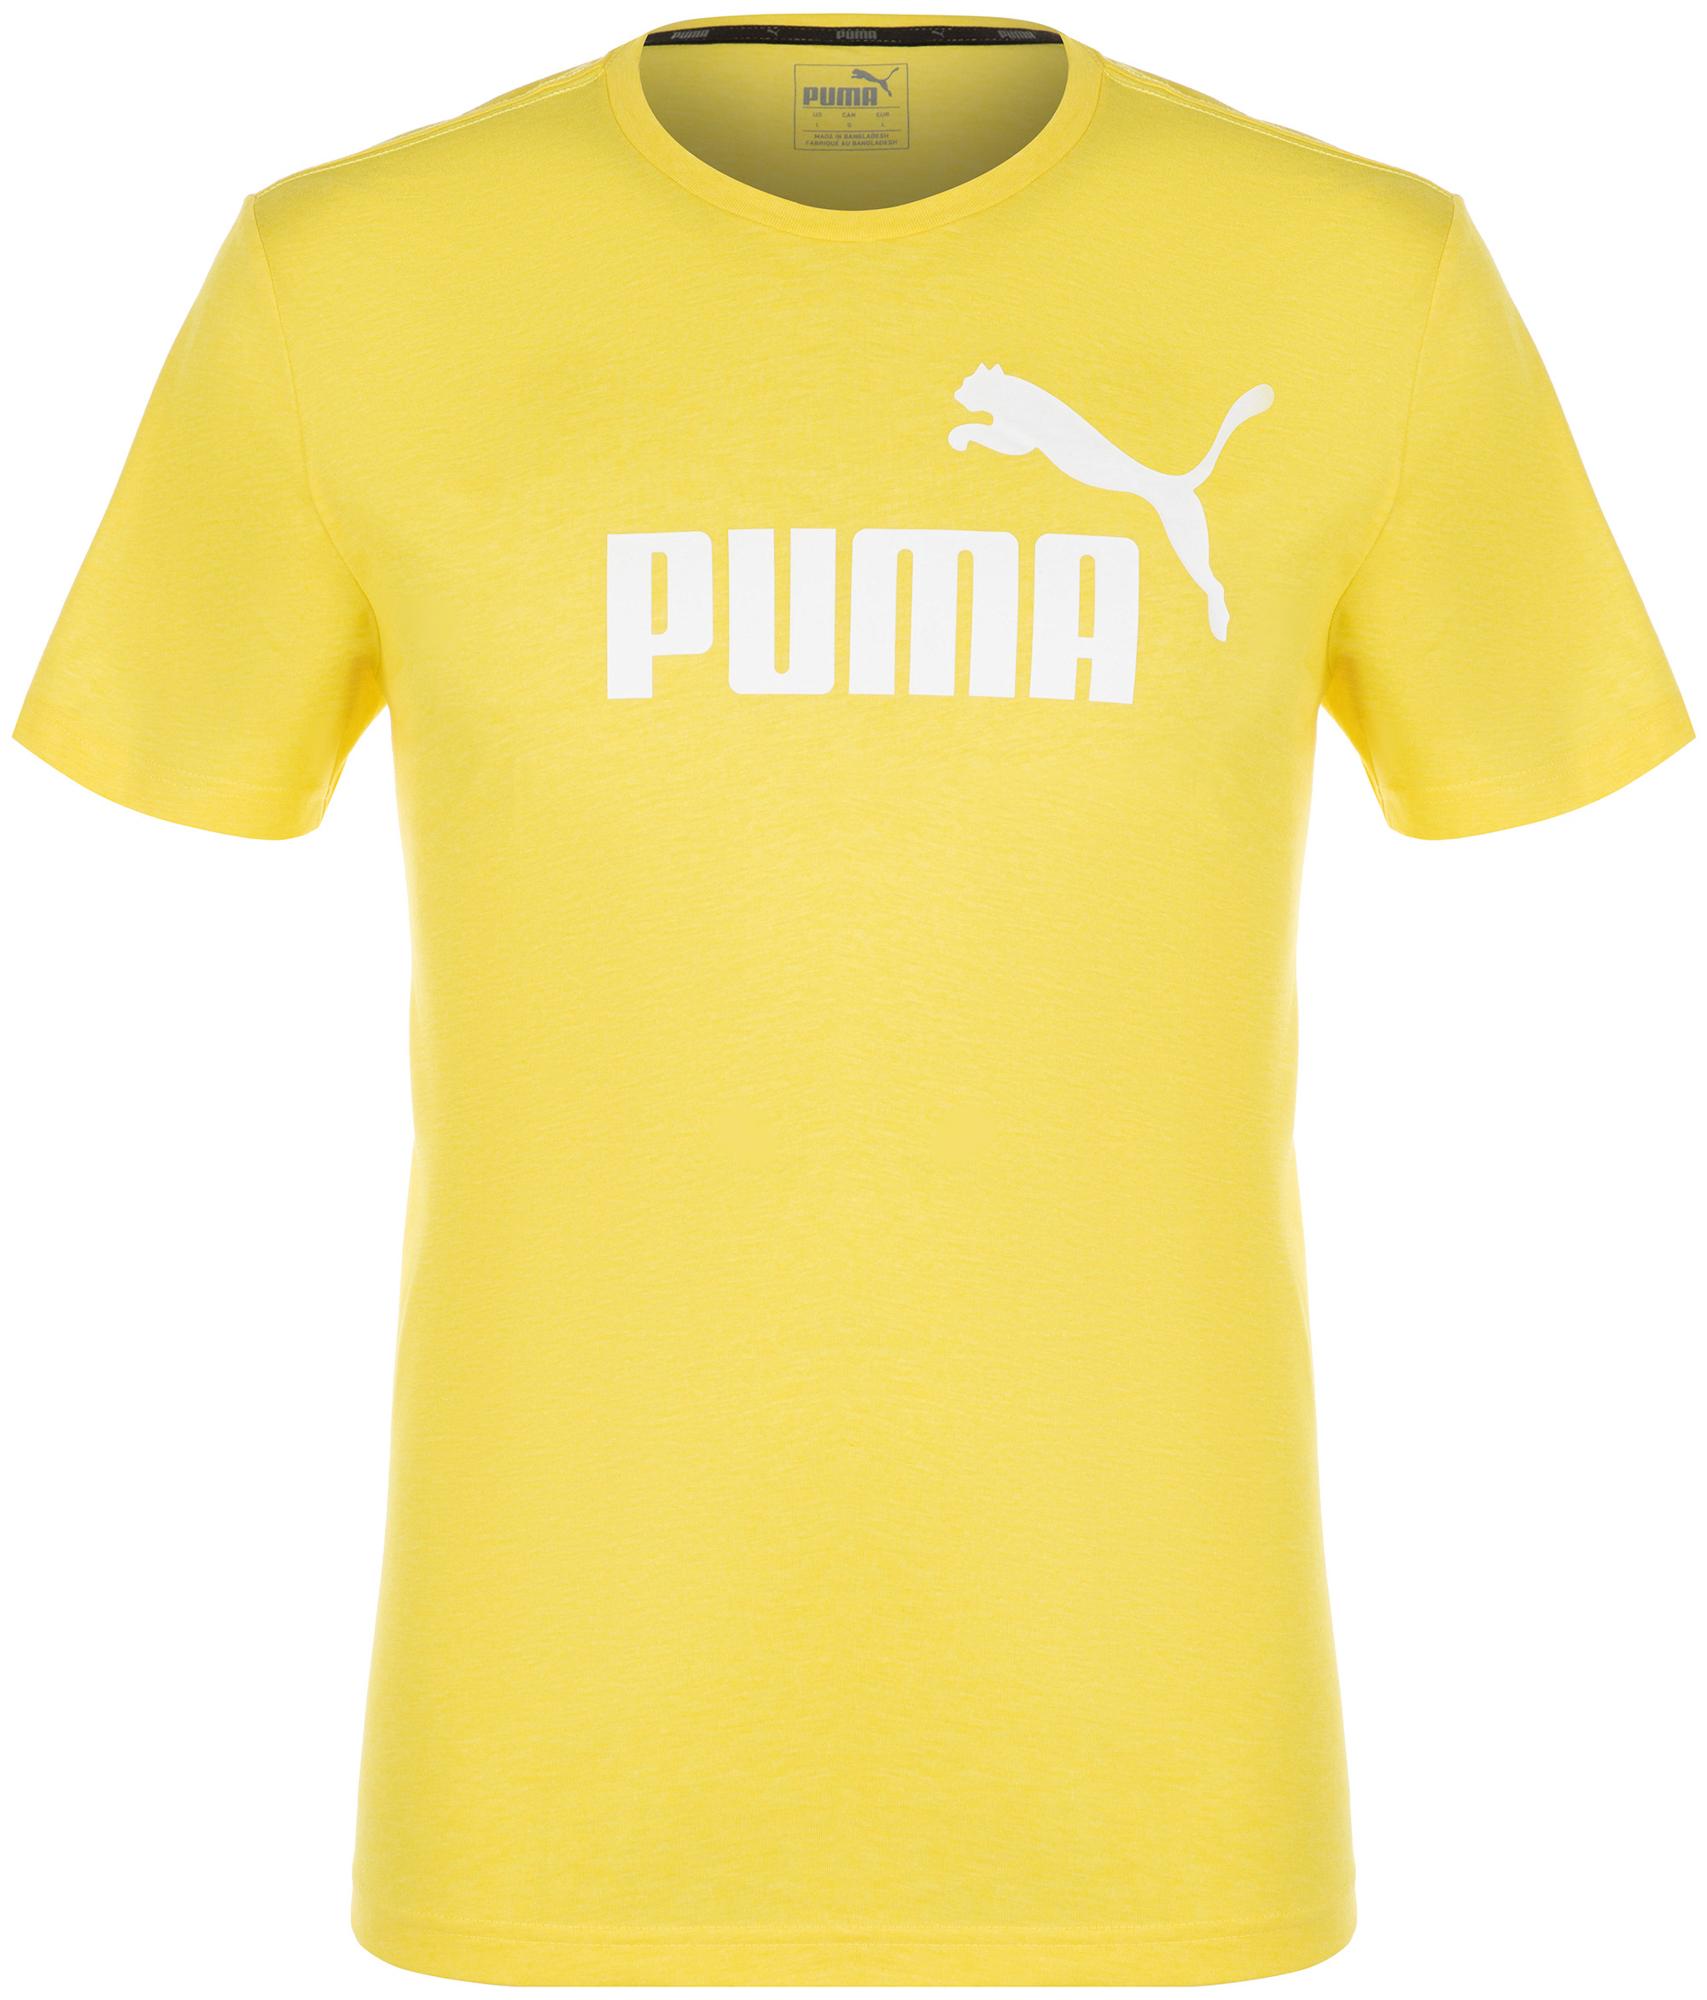 Puma Футболка мужская Puma ESS+ Heather, размер 50-52 футболка женская puma ess no 1 tee heather w цвет синий 83839920 размер s 42 44